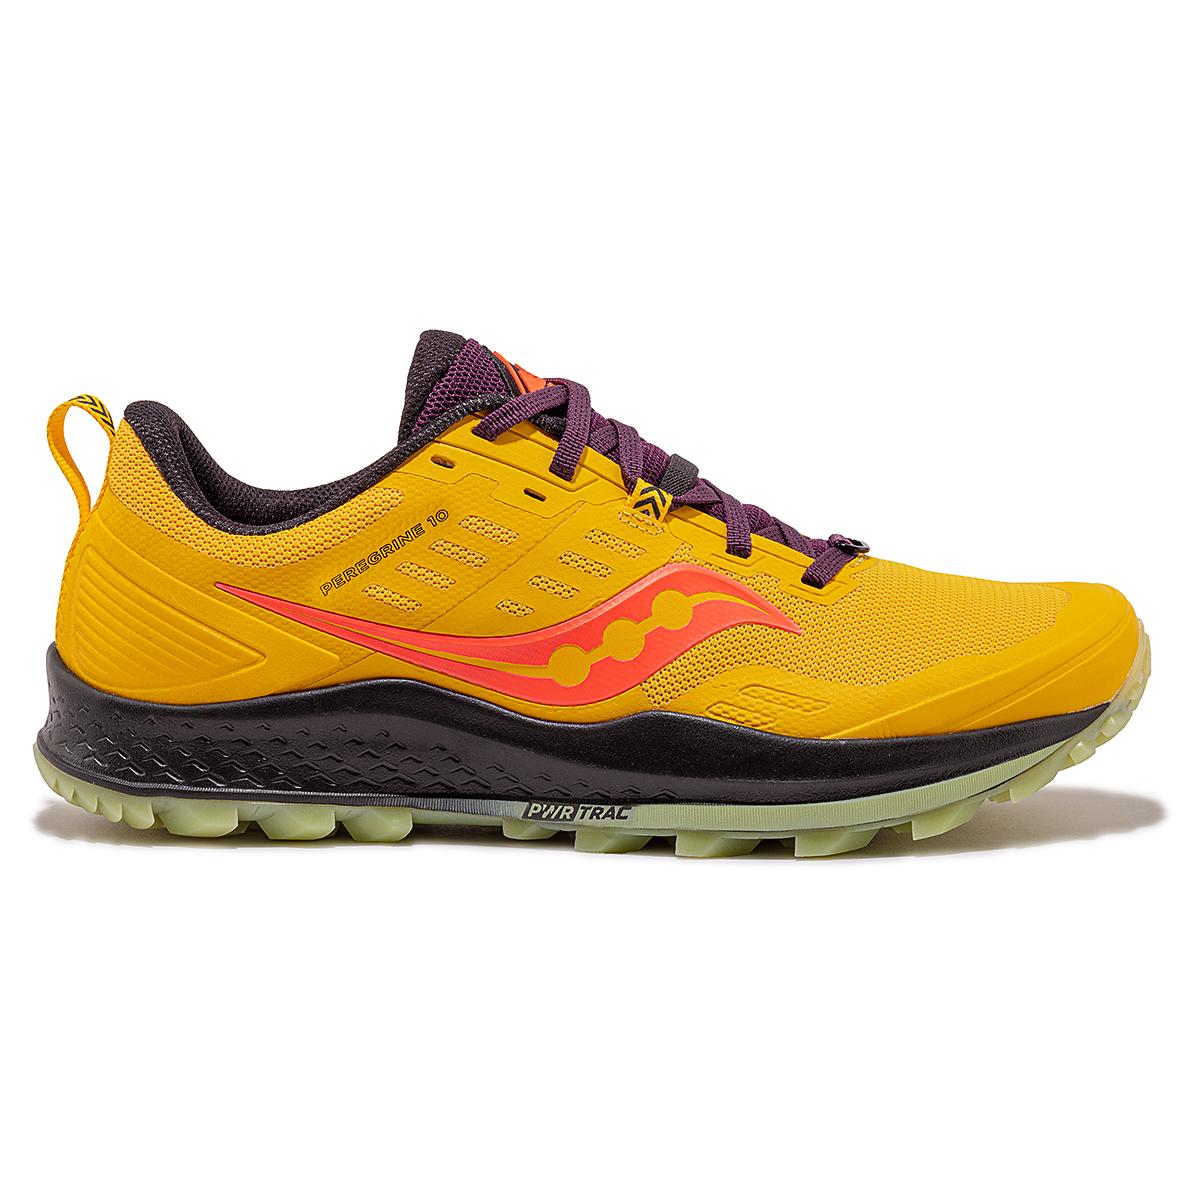 Saucony Jackalope 2.0 Peregrine 10 Trail Running Shoe $77.98 + Free Shipping